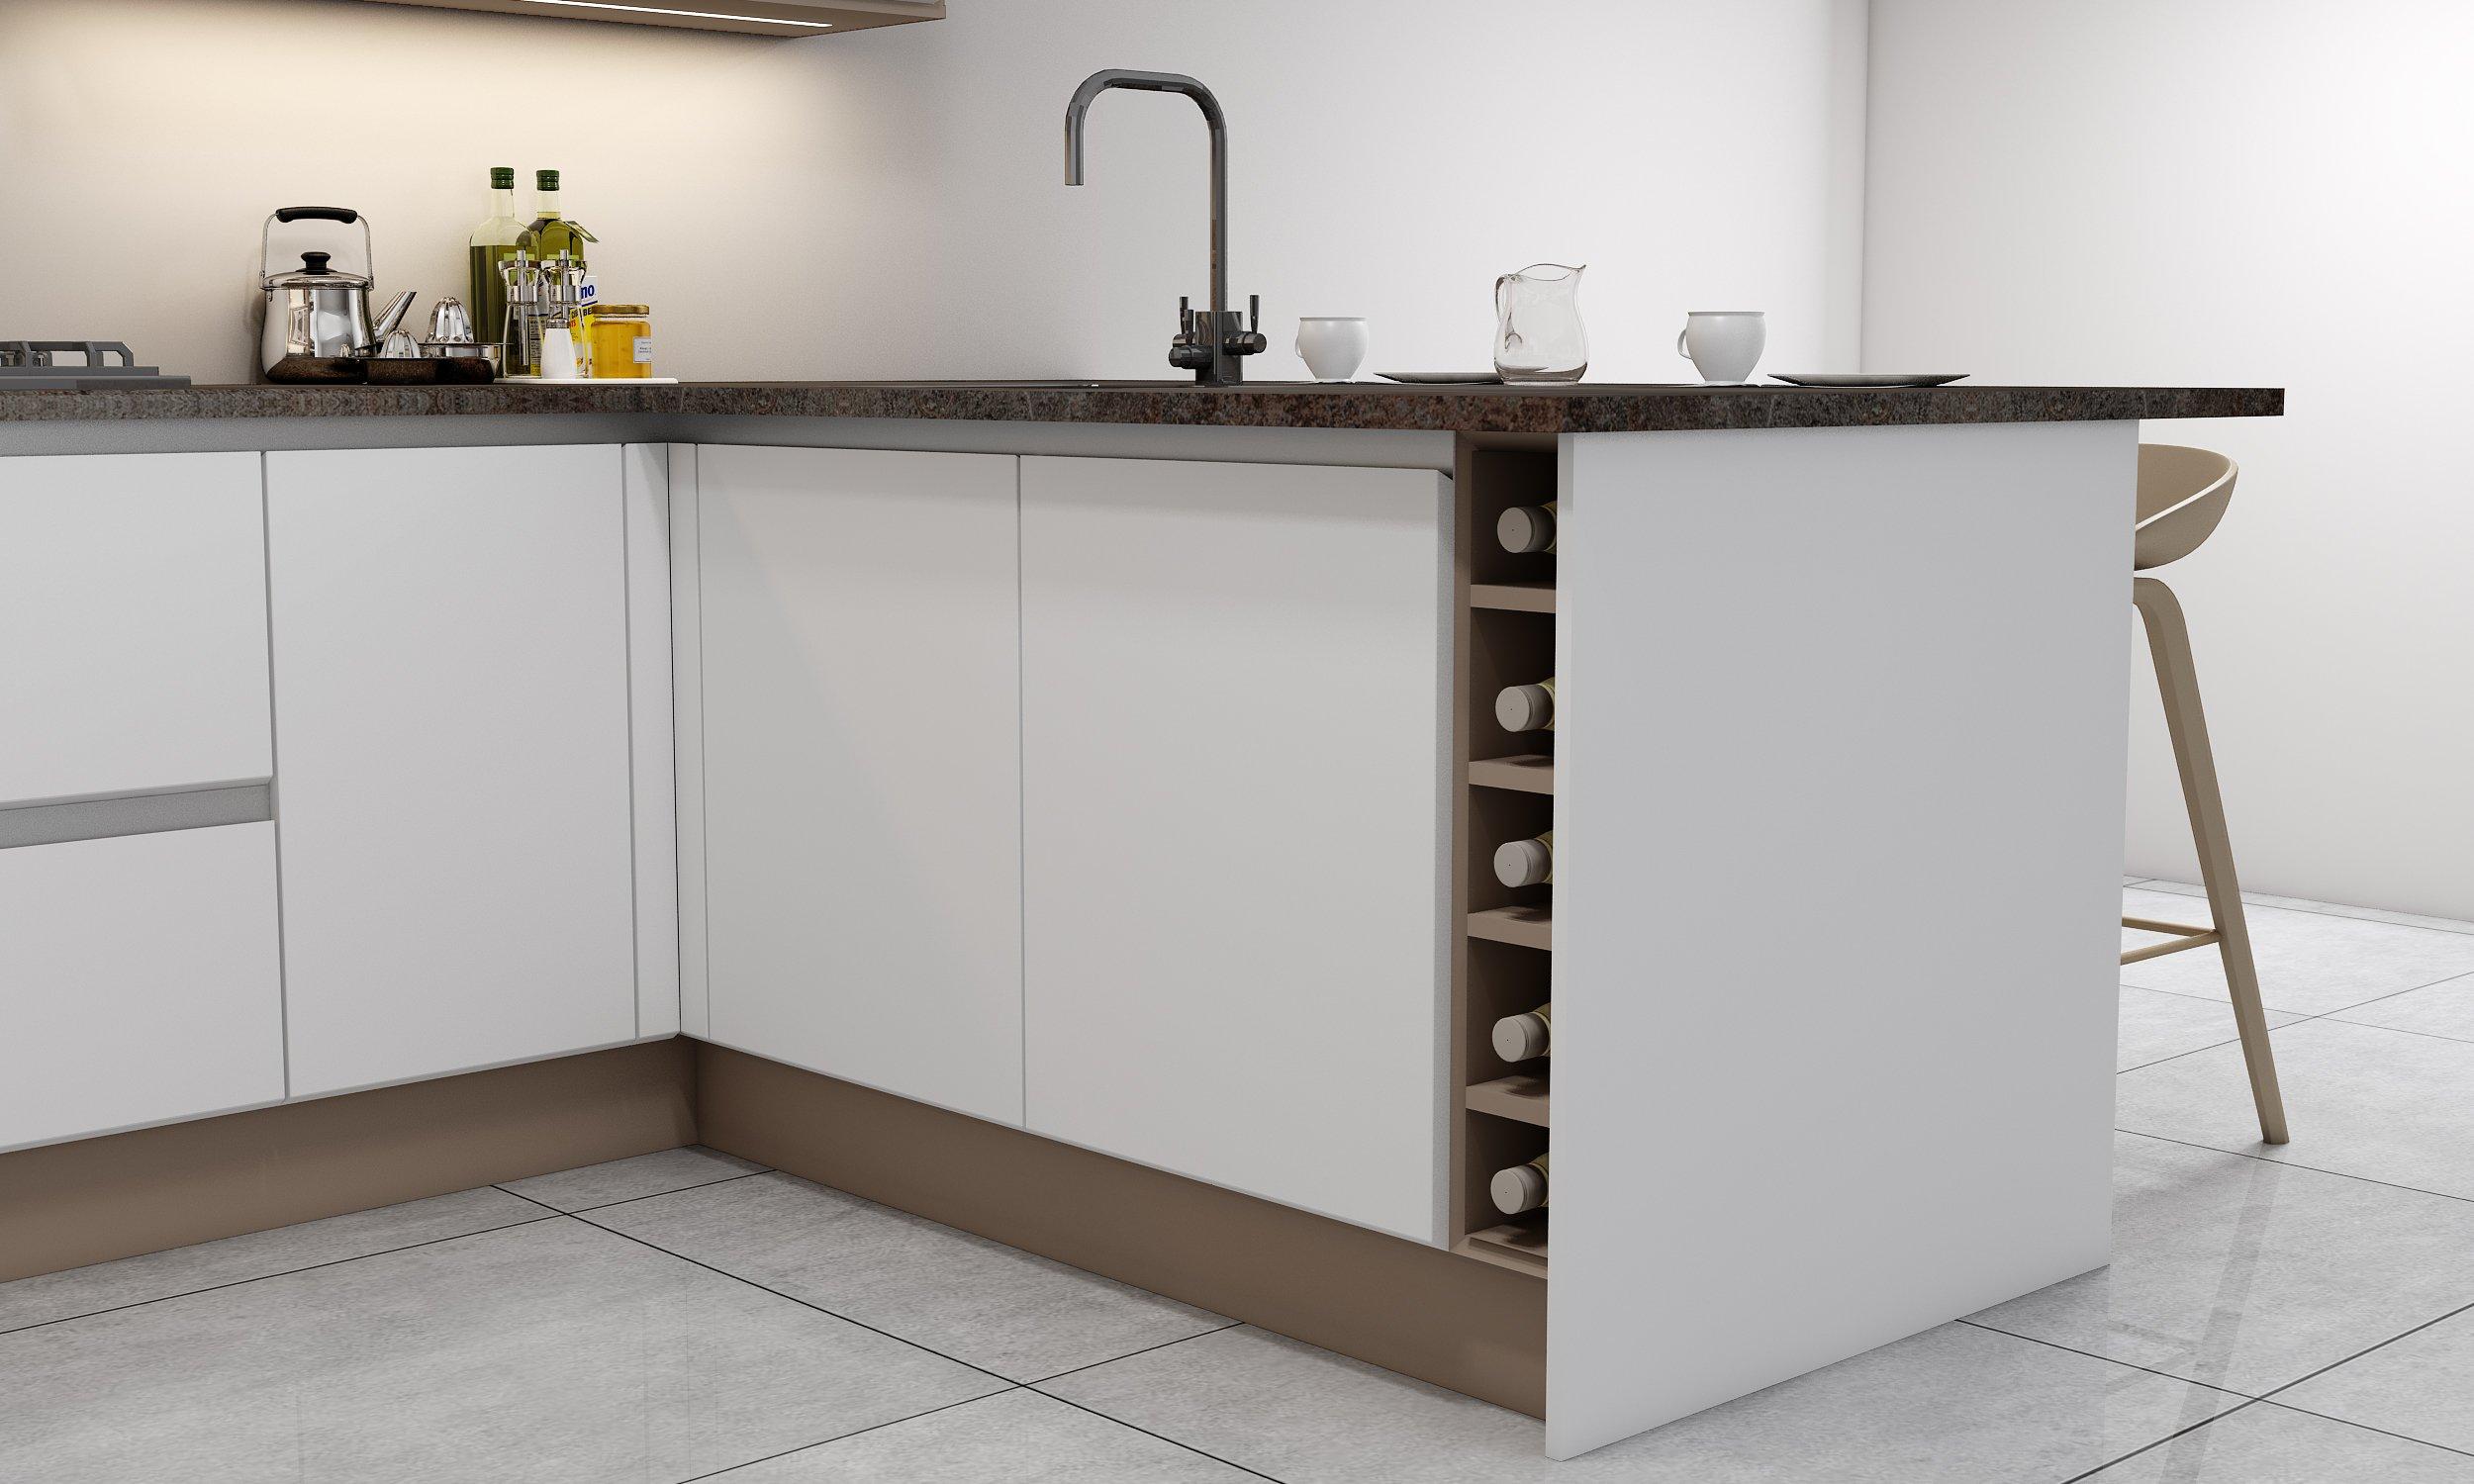 G Shape Handleless Kitchen in White Matt & Pebble Finish With Black Handle Along With Wine Rack